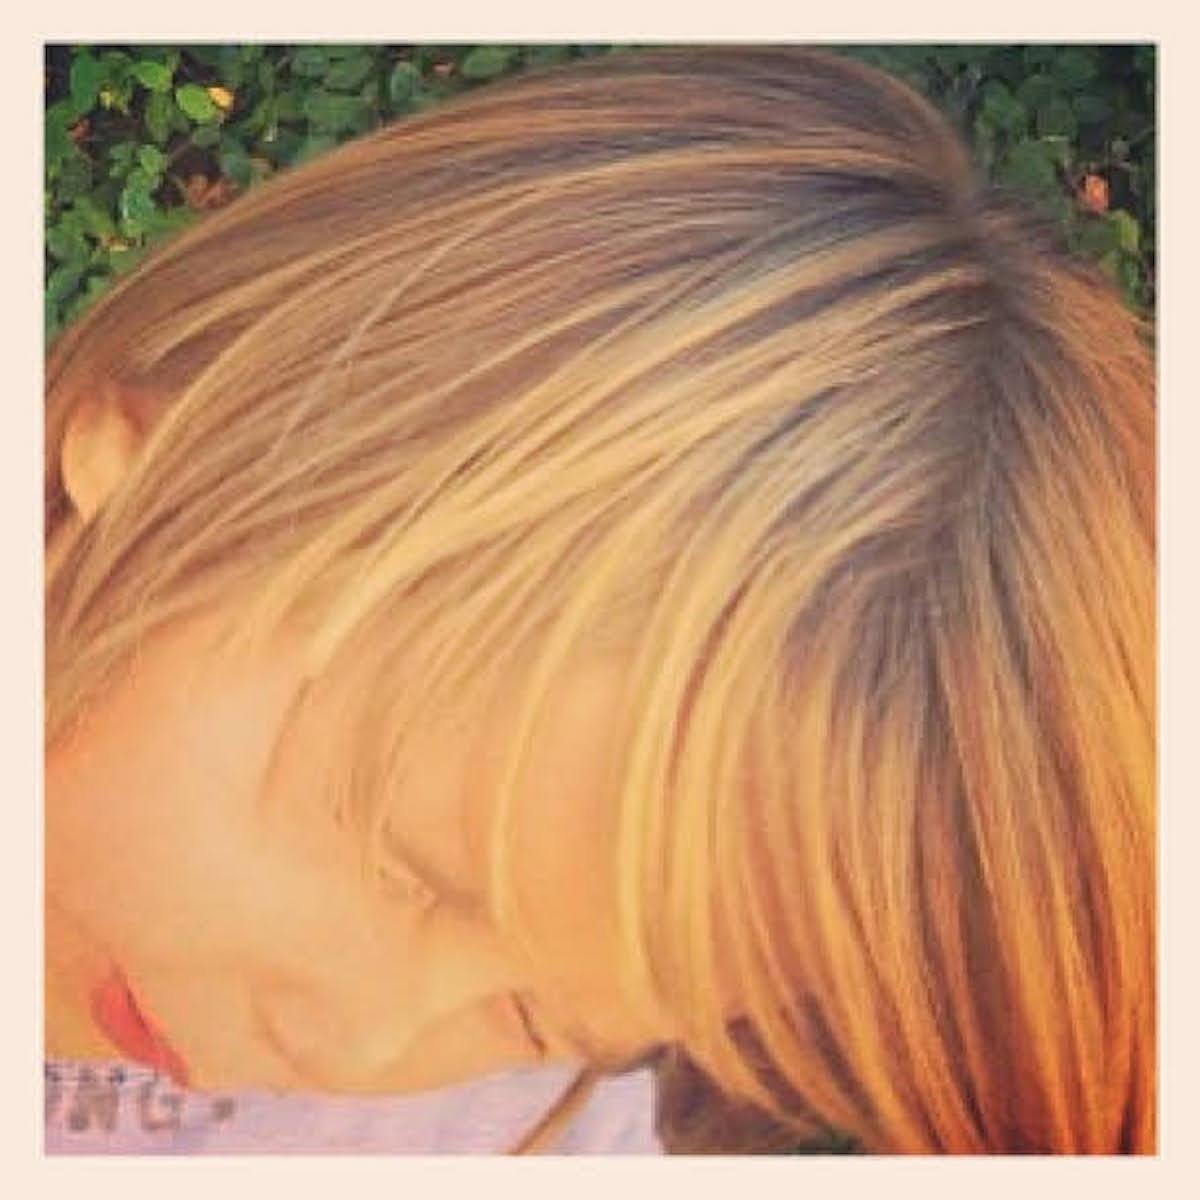 Julian hair